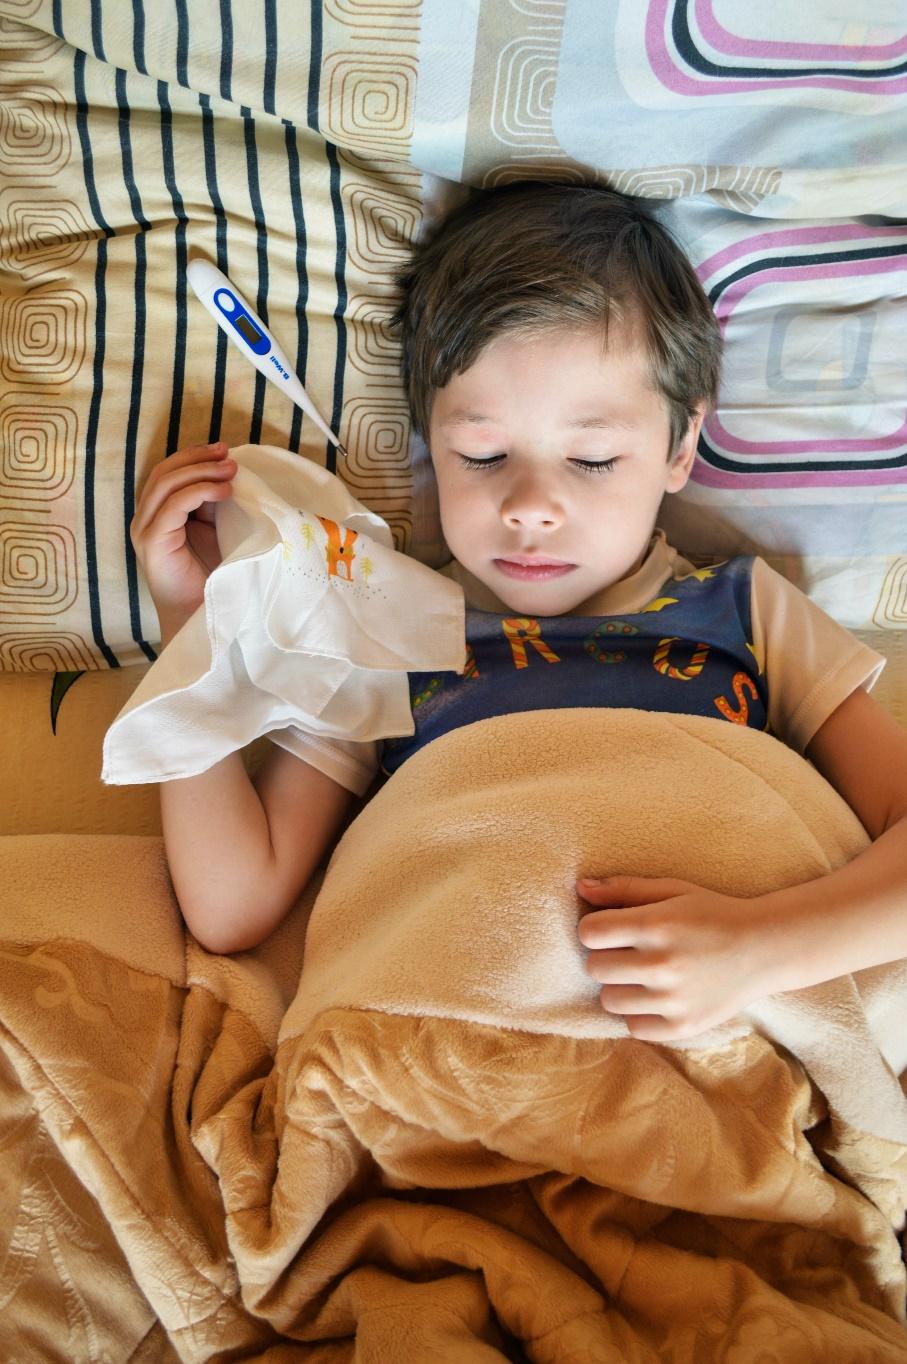 A sick boy lying in bed